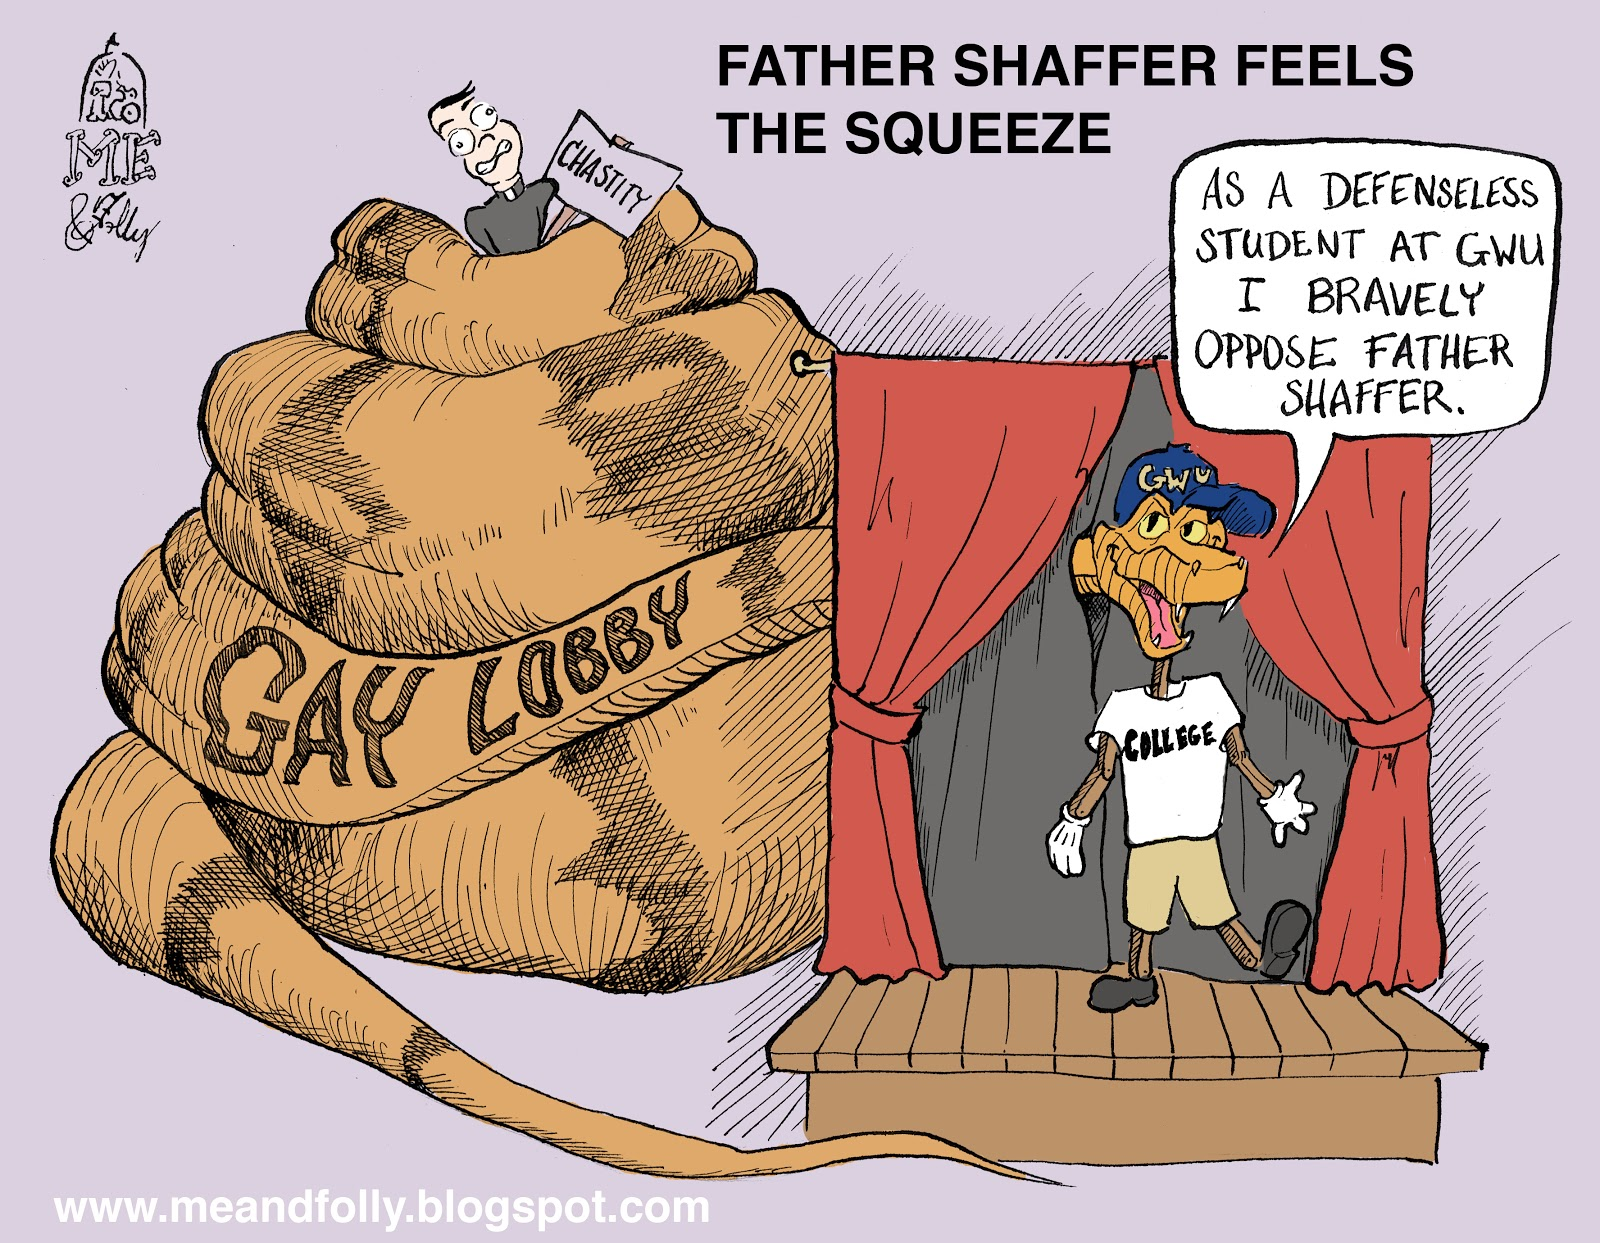 FatherShaffer